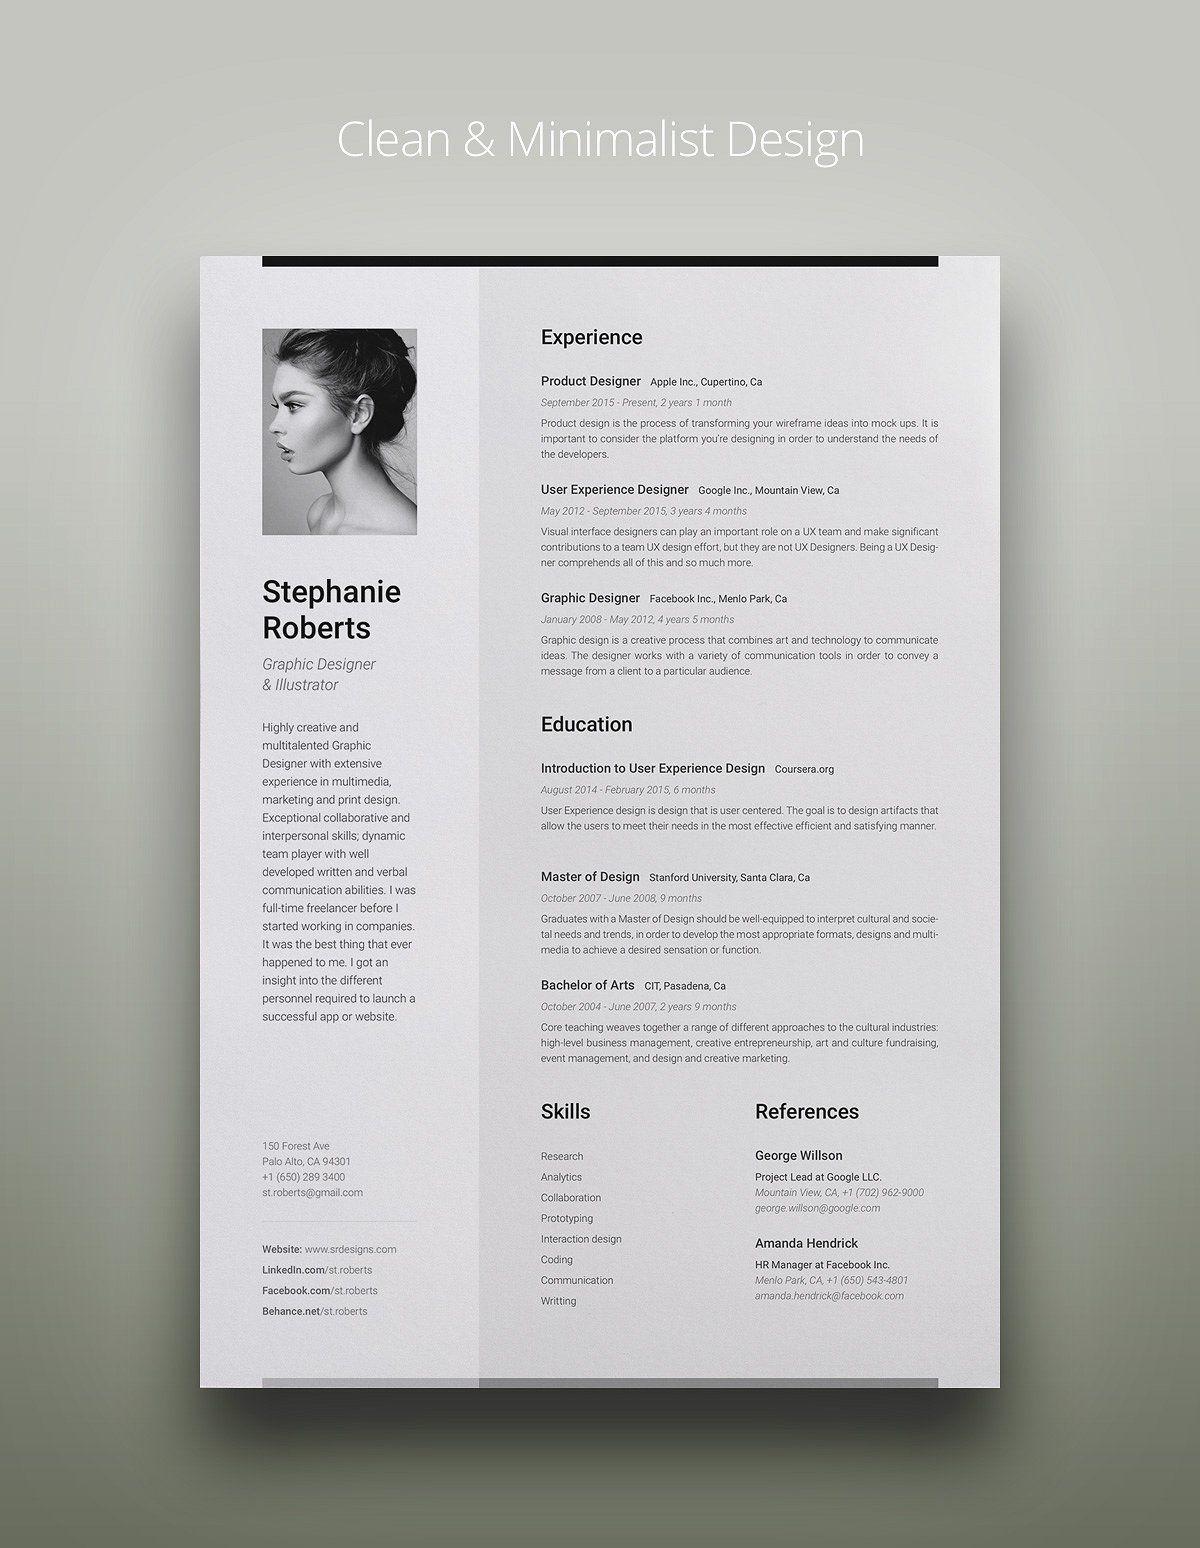 Professional Resume 1 V Cg Resume Design Creative Resume Resume Design